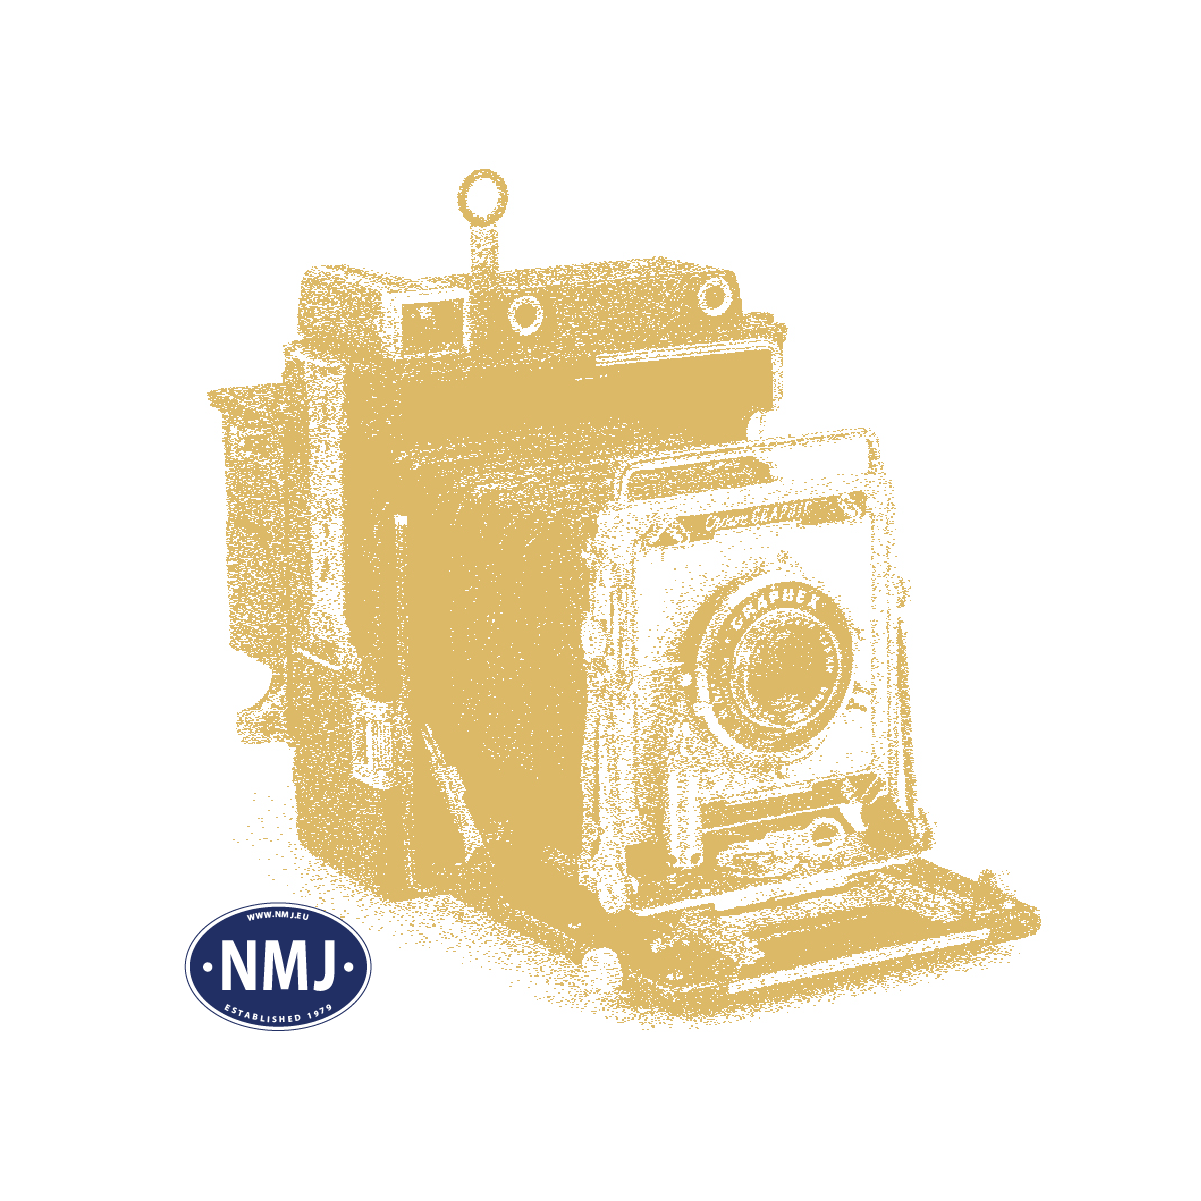 NMJT87.201 - NMJ Topline NSB El11b.2148, Gammeldesign, DC